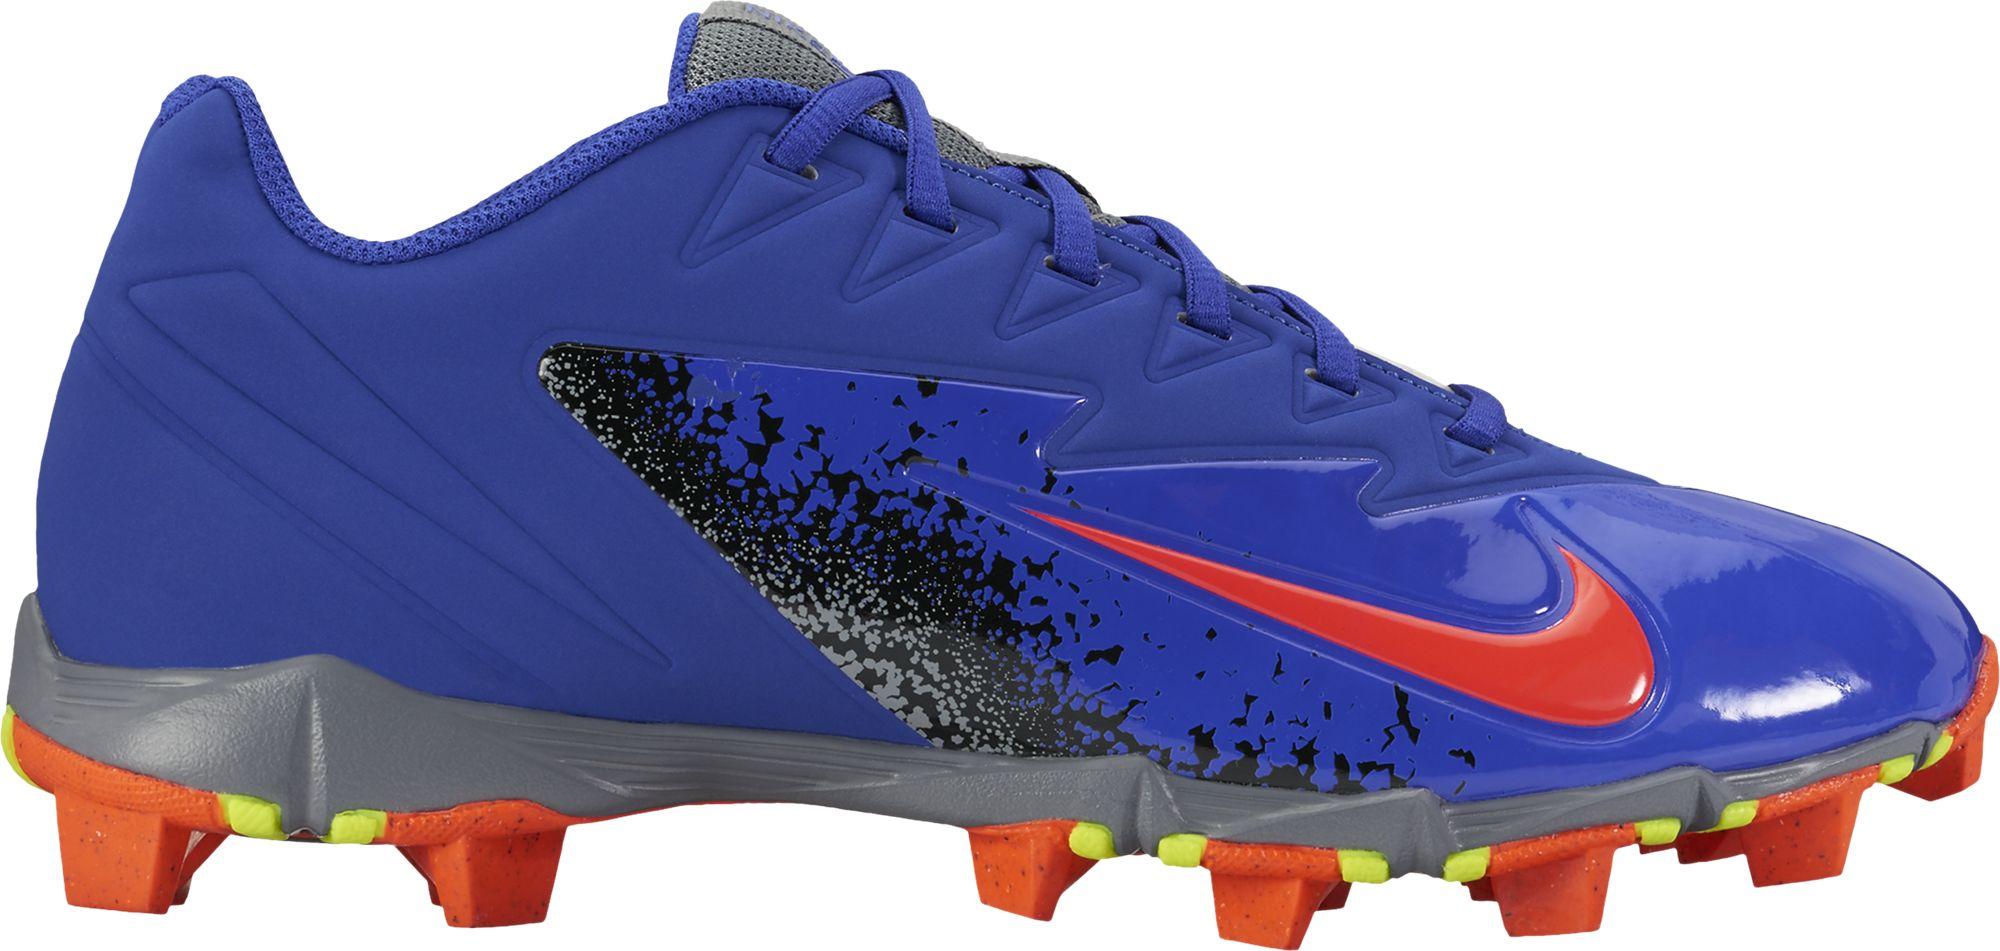 748dd4f4f36 Men s Nike Vapor Ultrafly Keystone Baseball Cleat - Sieverts Sporting Goods